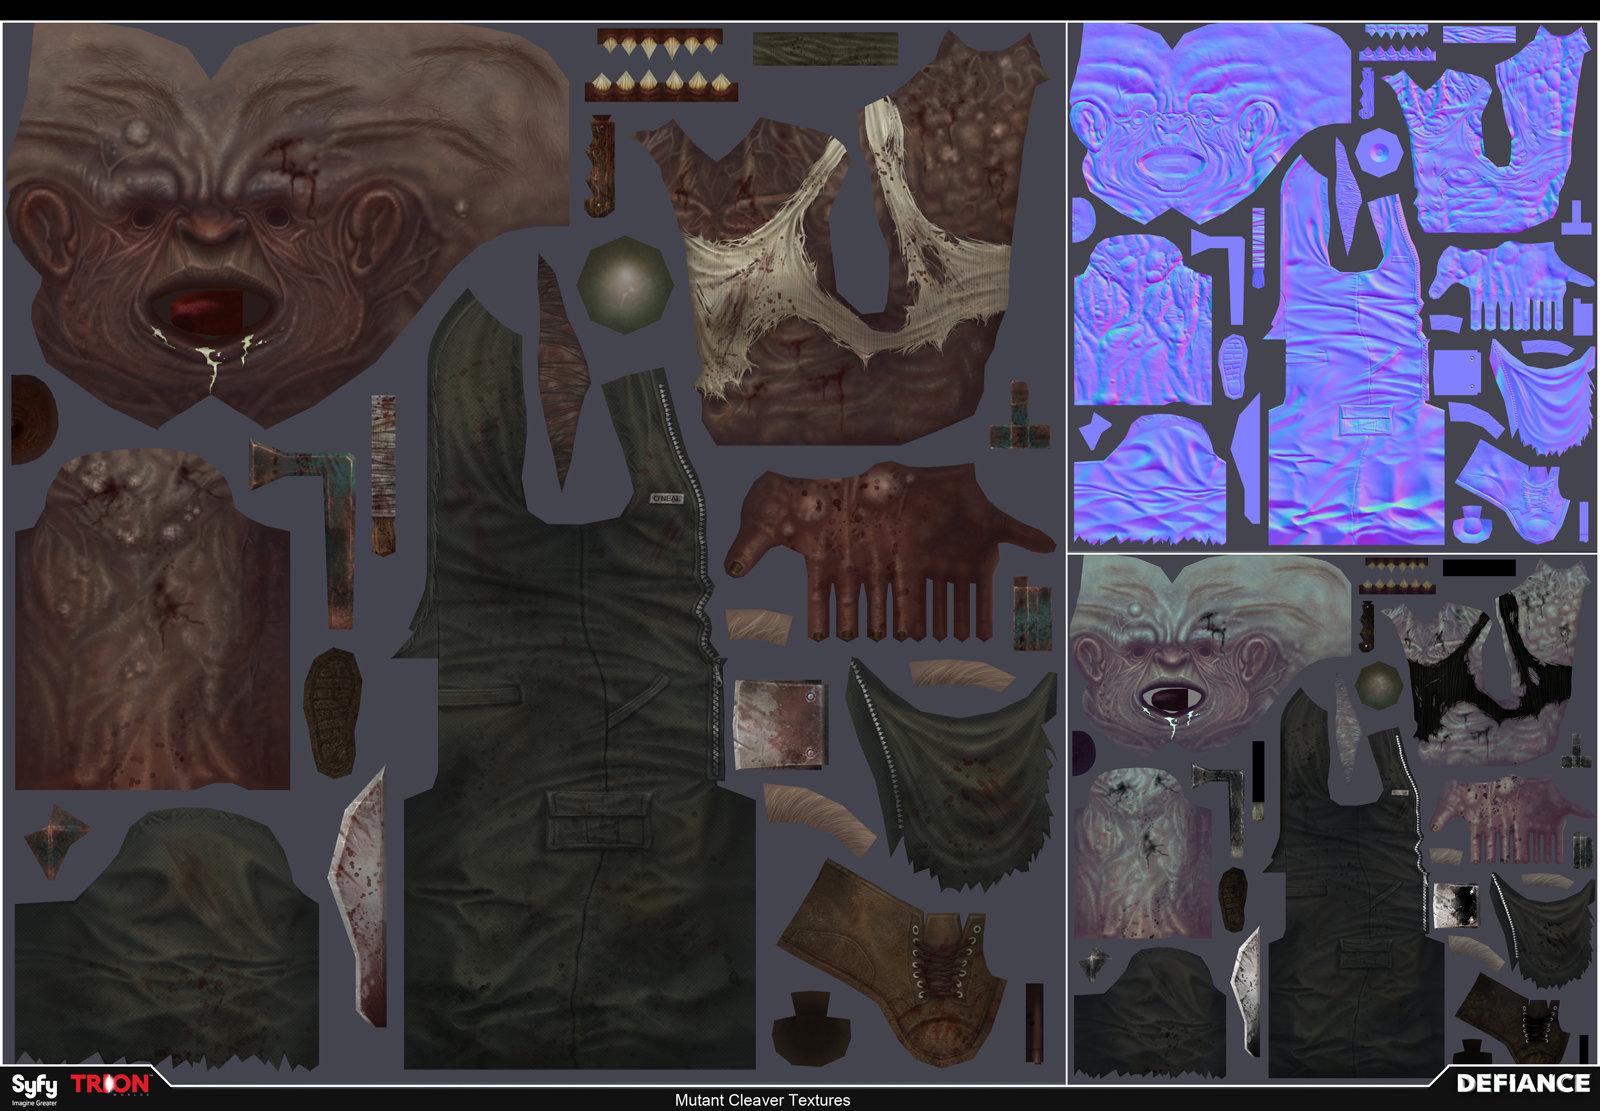 Satoshi arakawa npc mutant cleaver textures